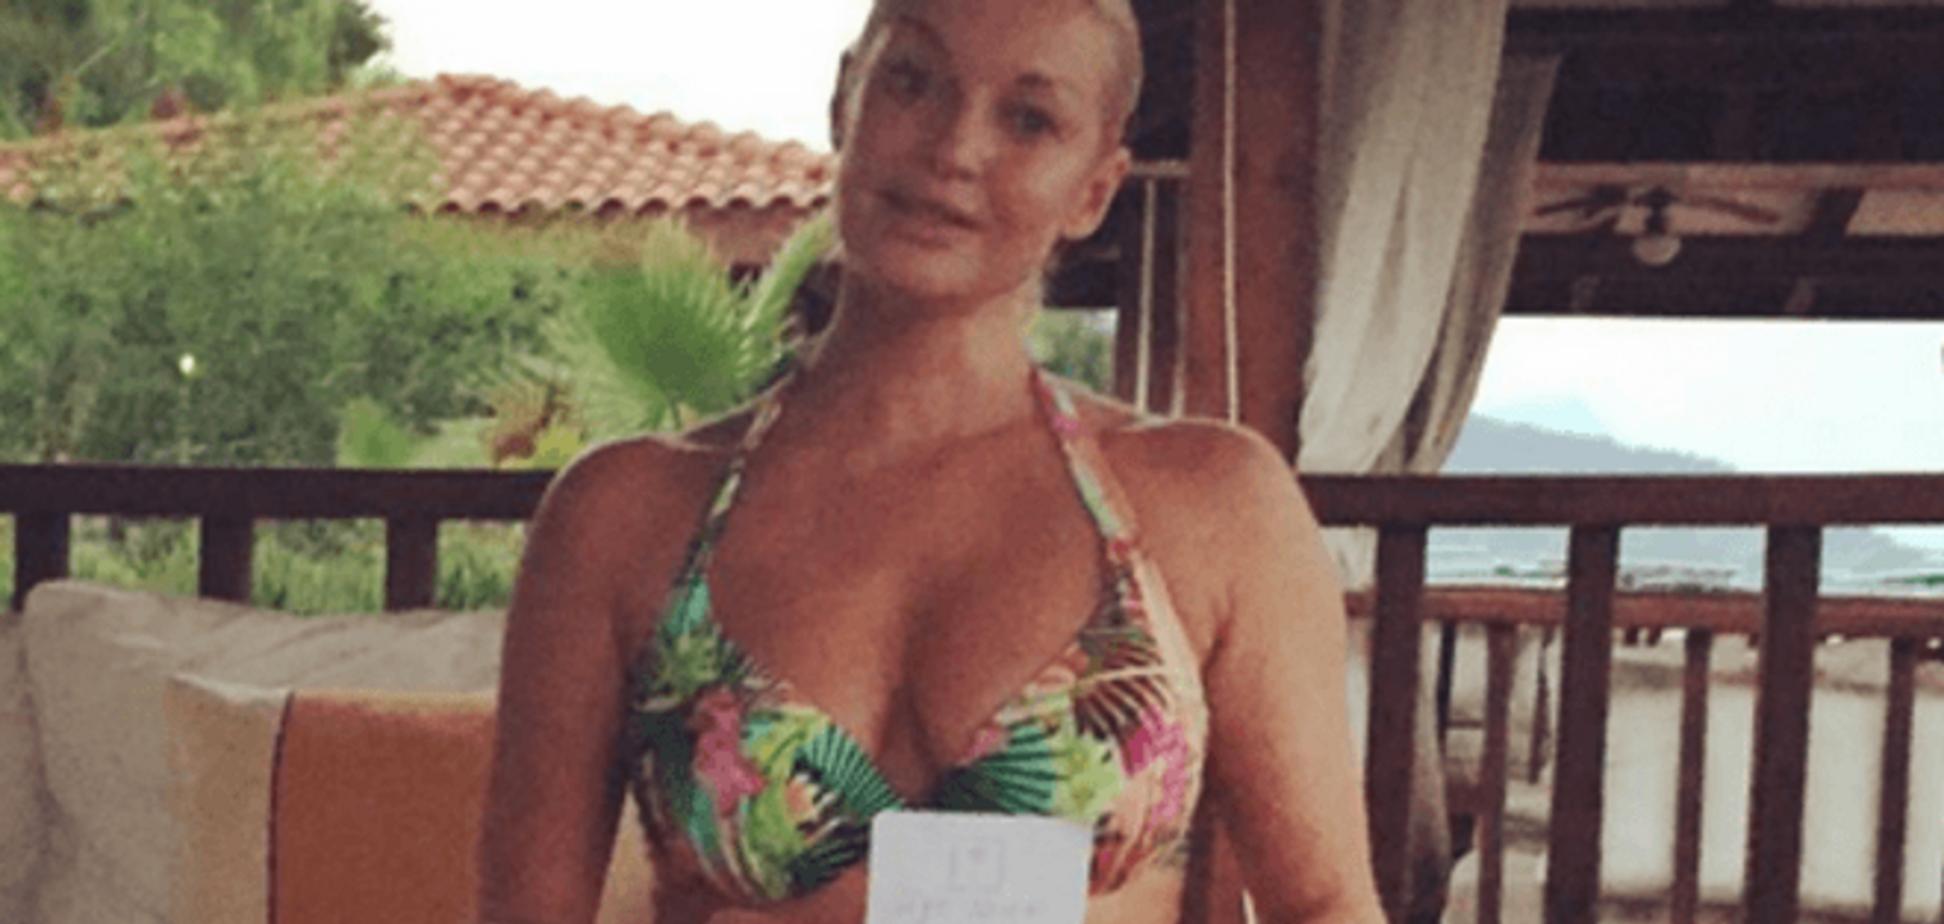 Волочкова на пляже получила сюрприз от тайного поклонника